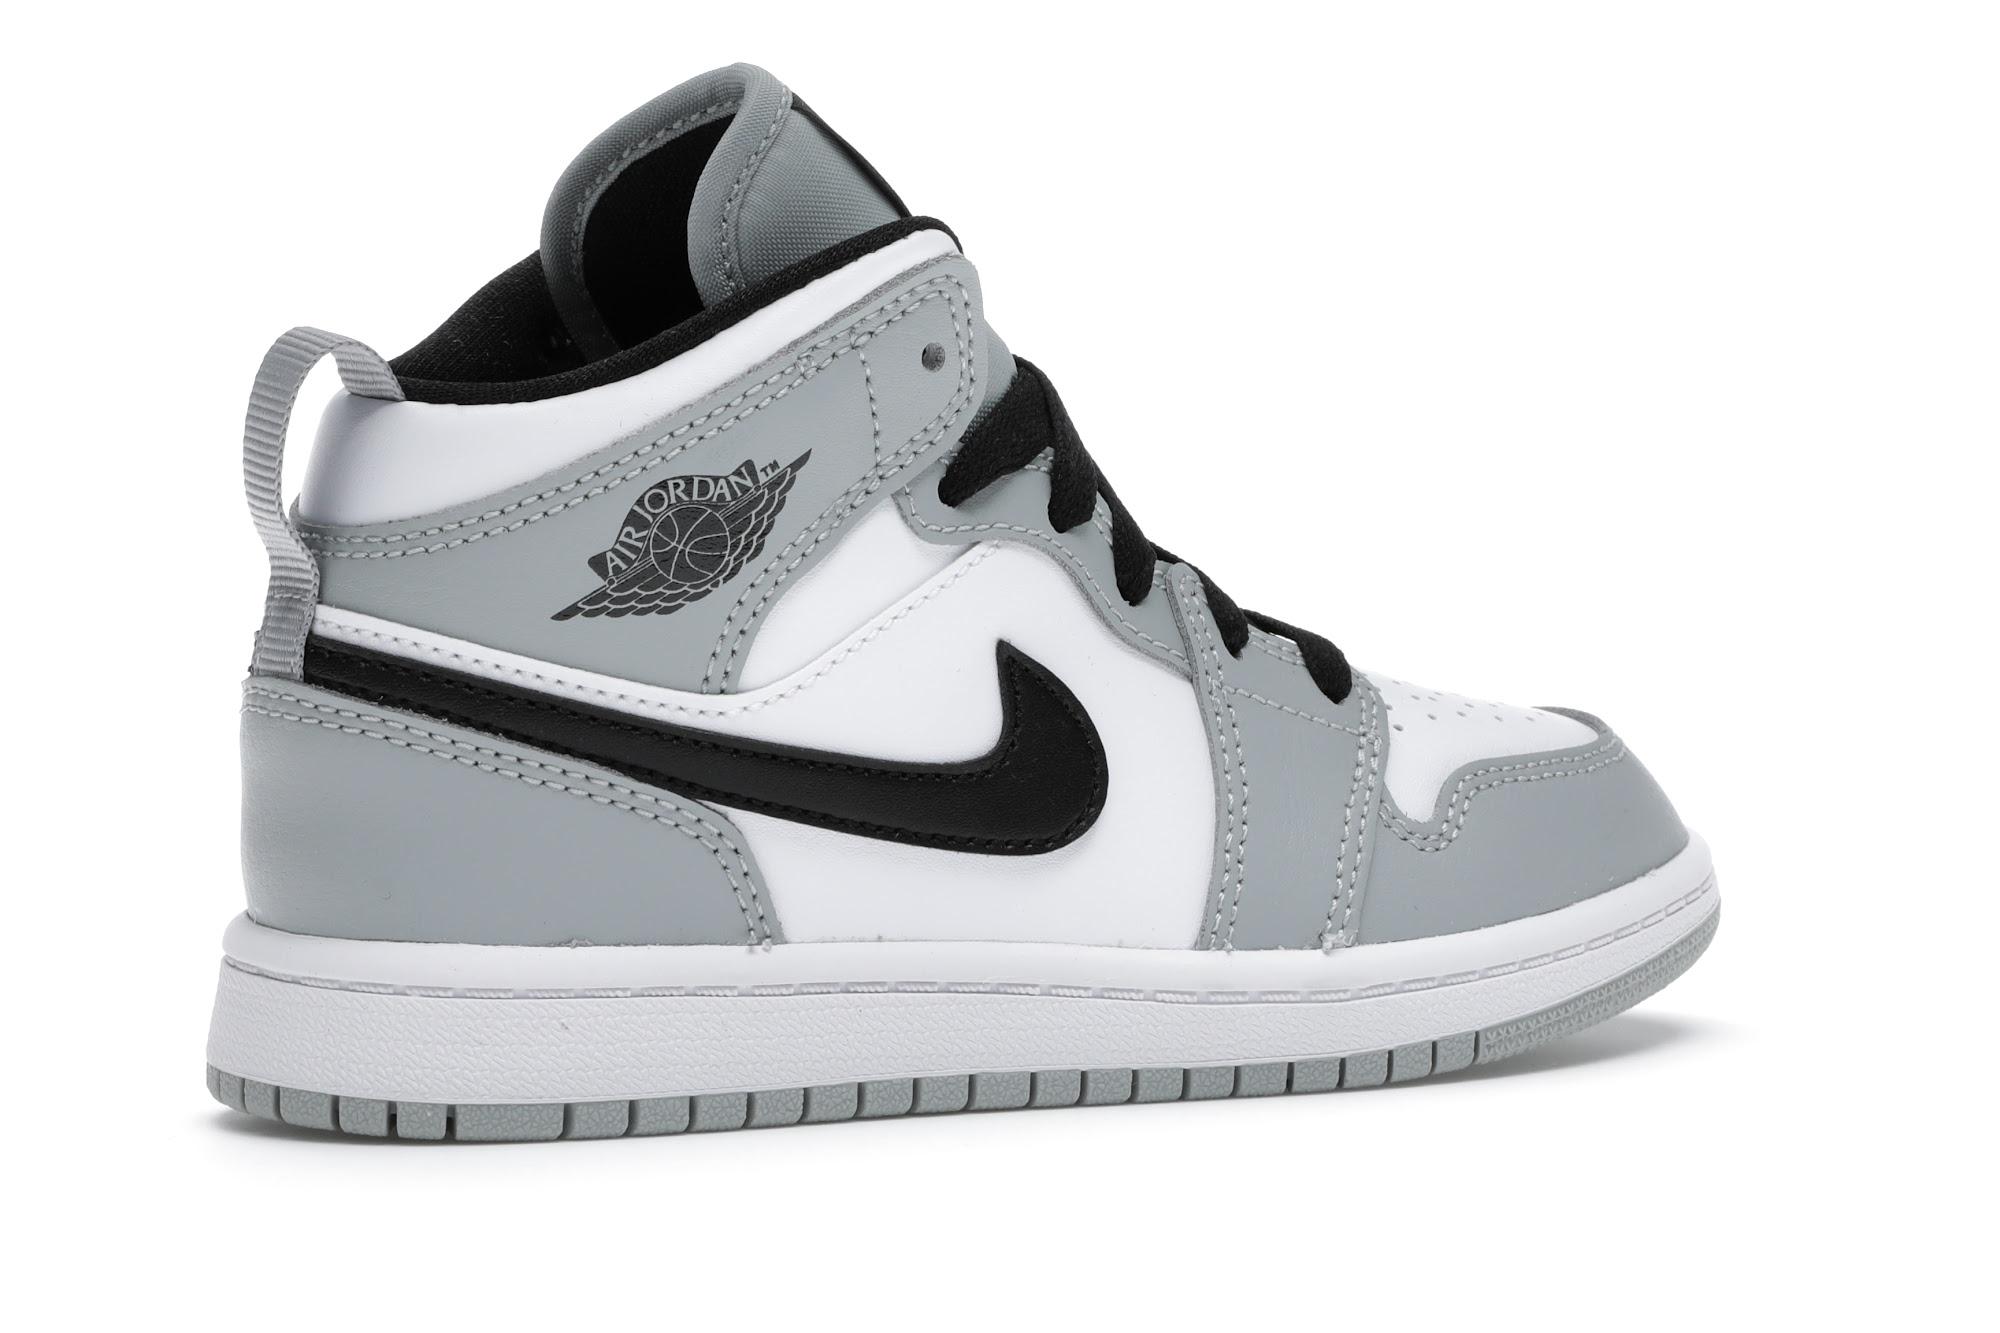 Jordan 1 Mid Light Smoke Grey (PS)